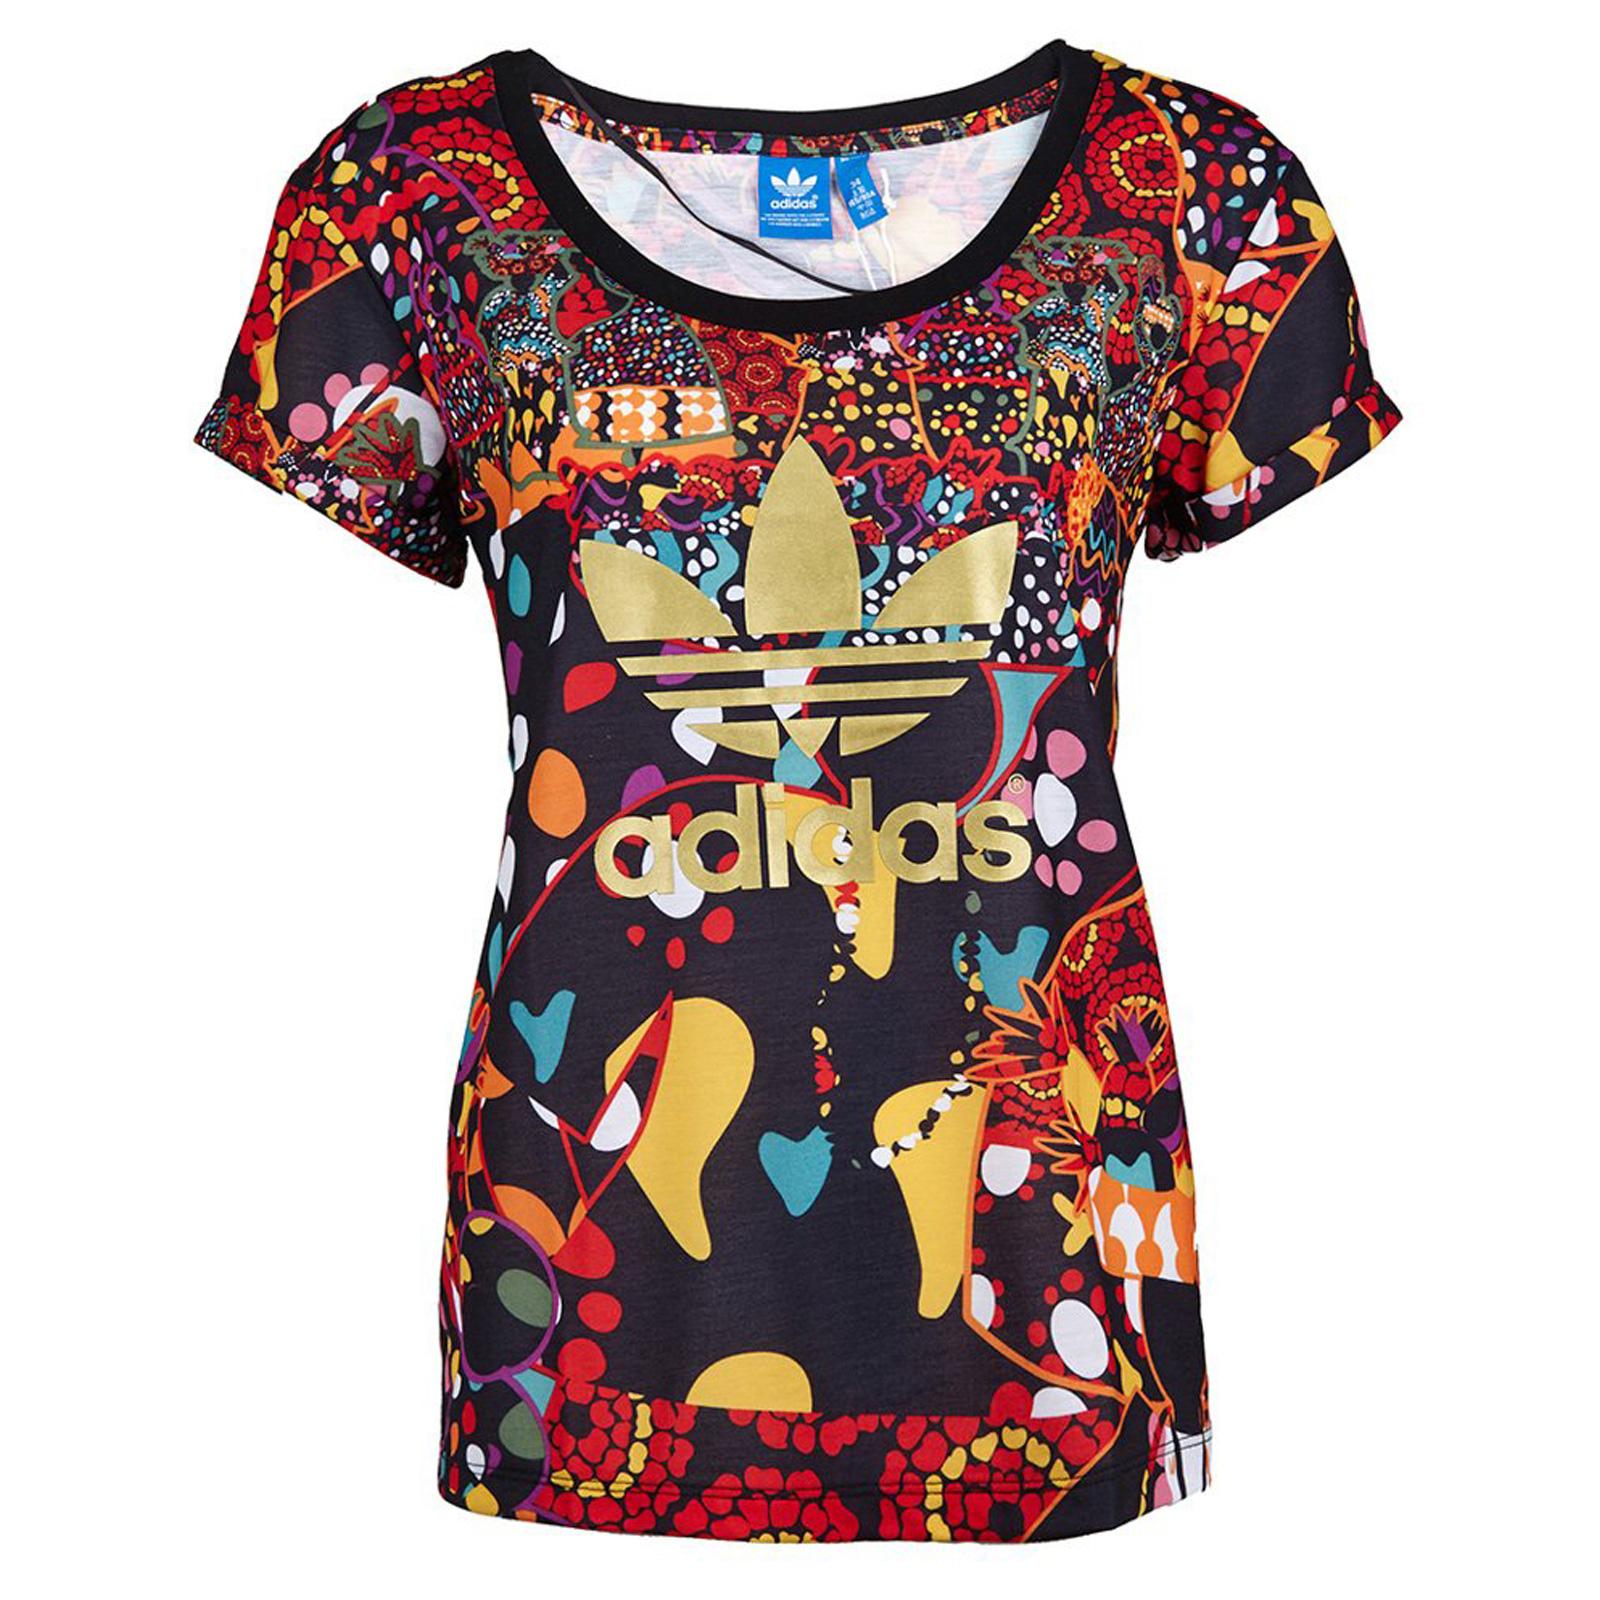 Details zu adidas Originals X The Farm Damen Trefoil Shirt Maracatu Tee AOP M30784